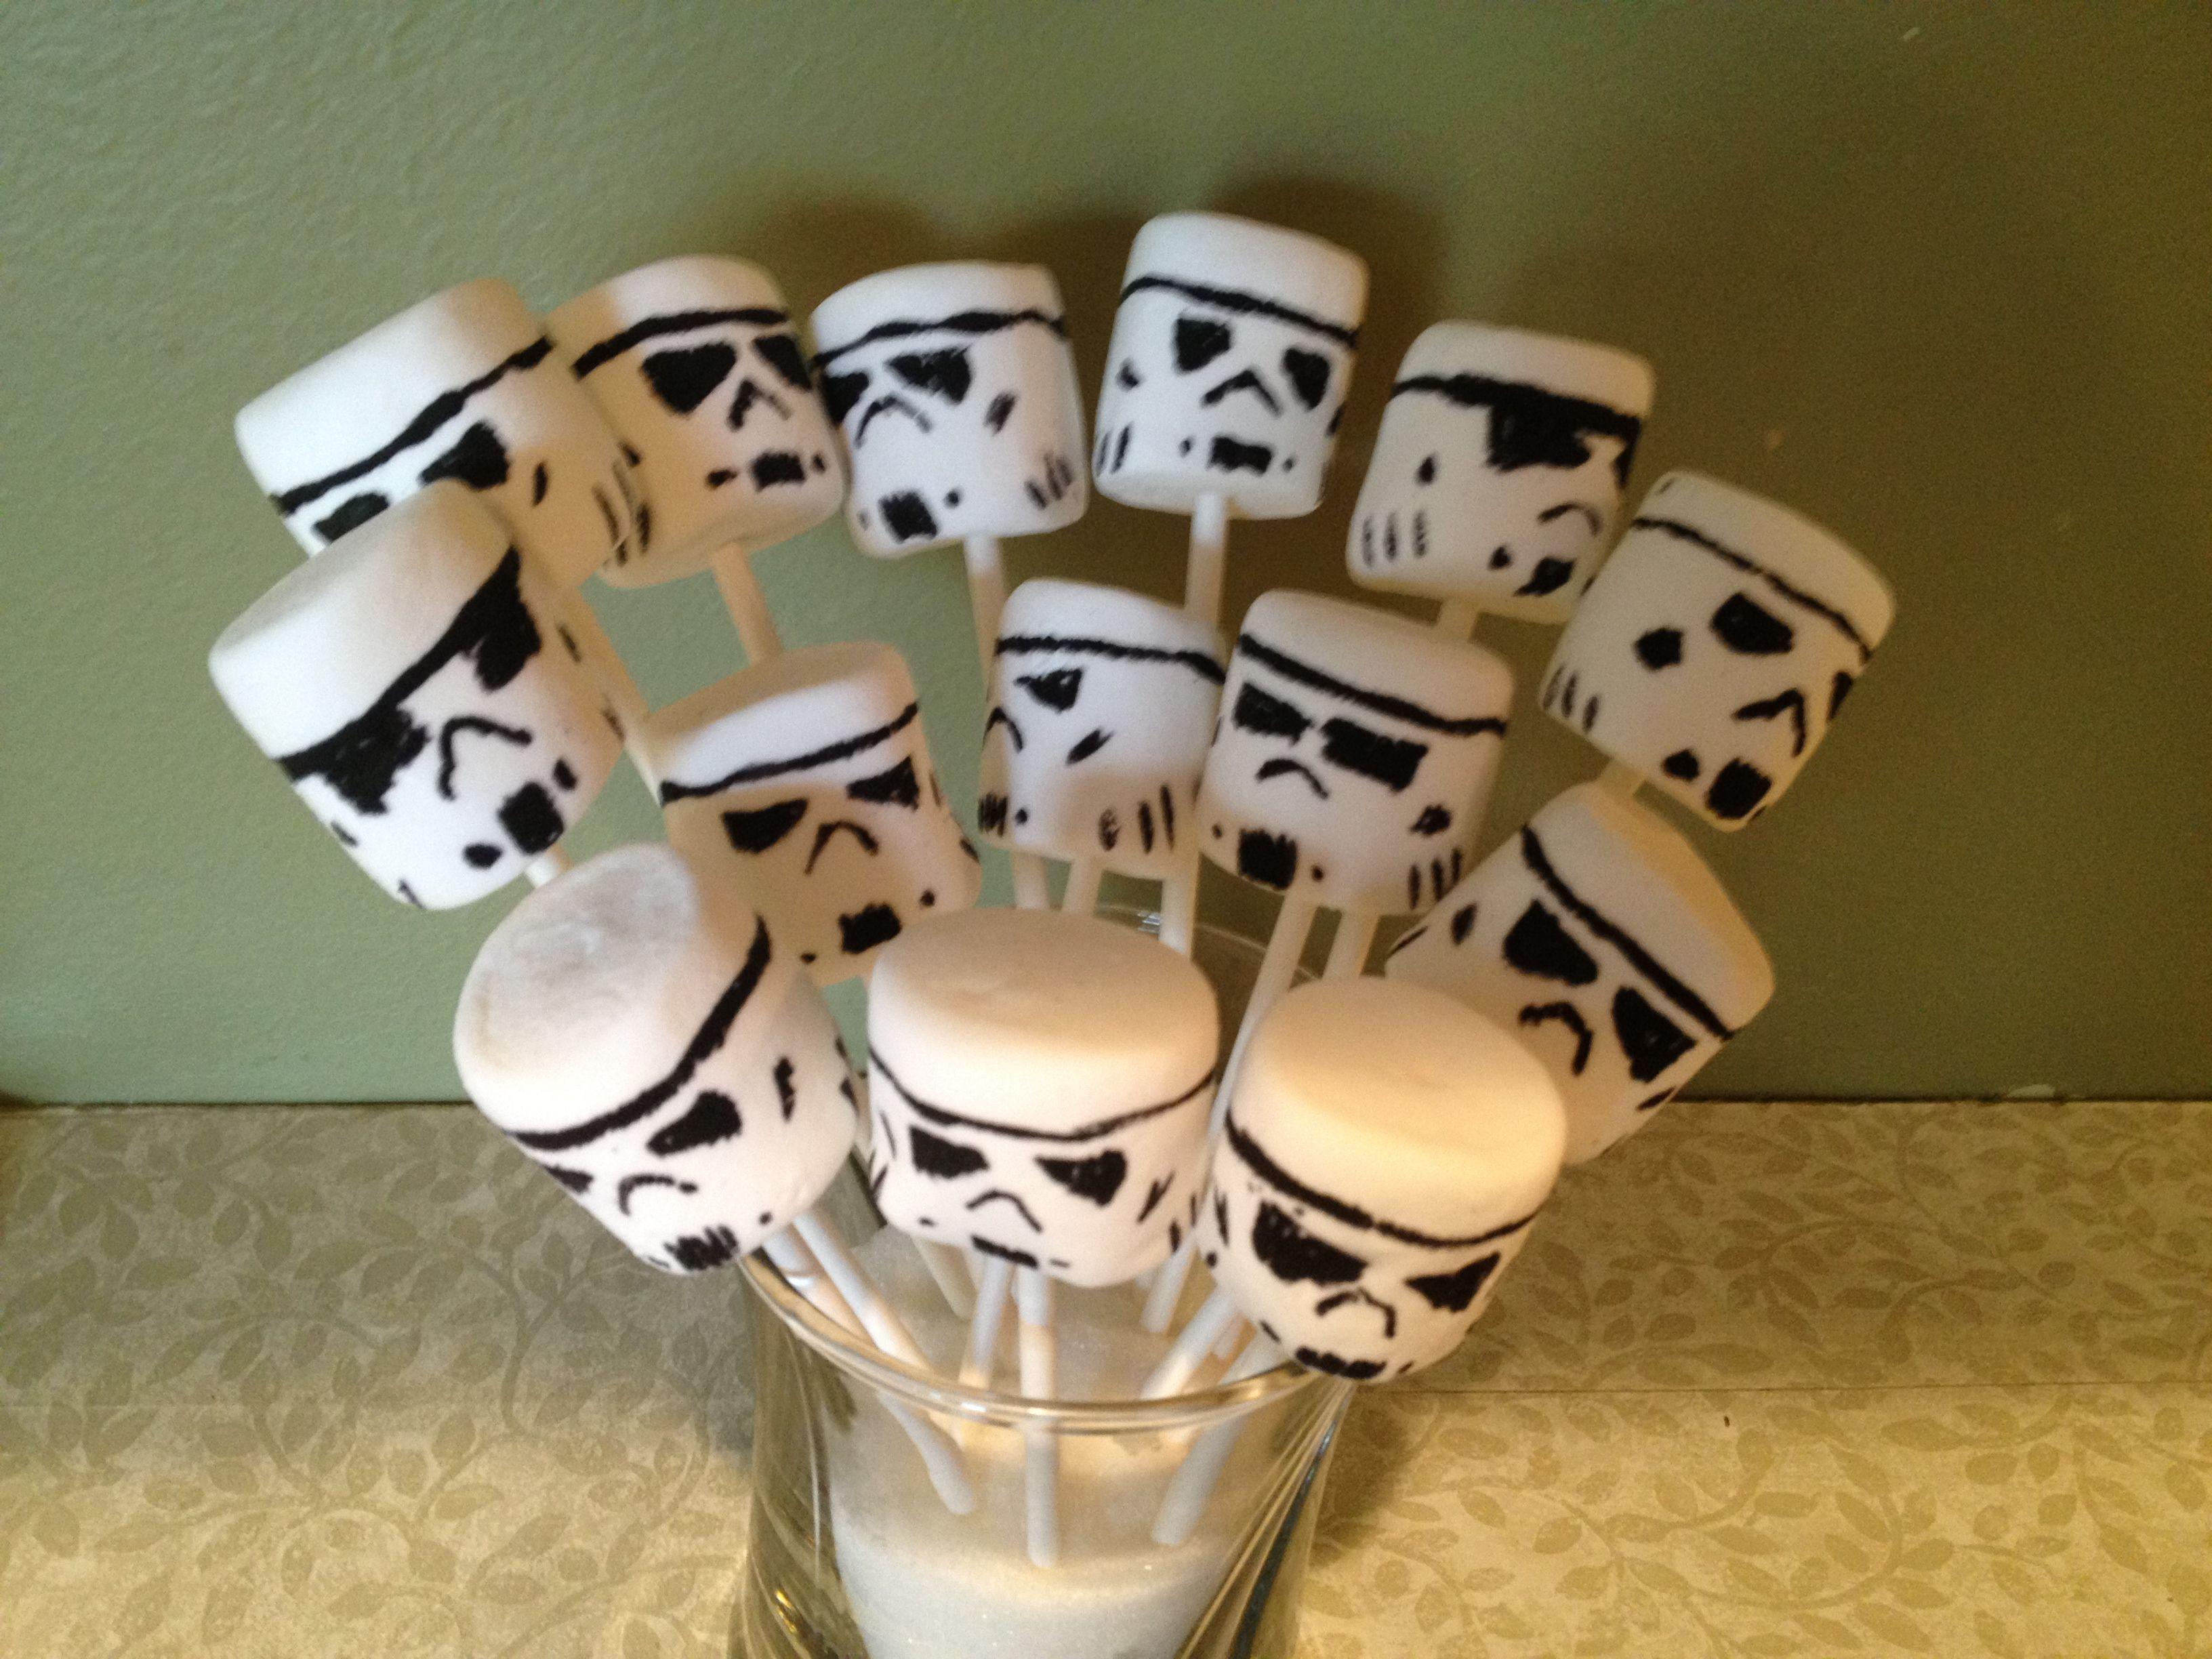 Storm trooper marshmallow pops for Ben's birthday